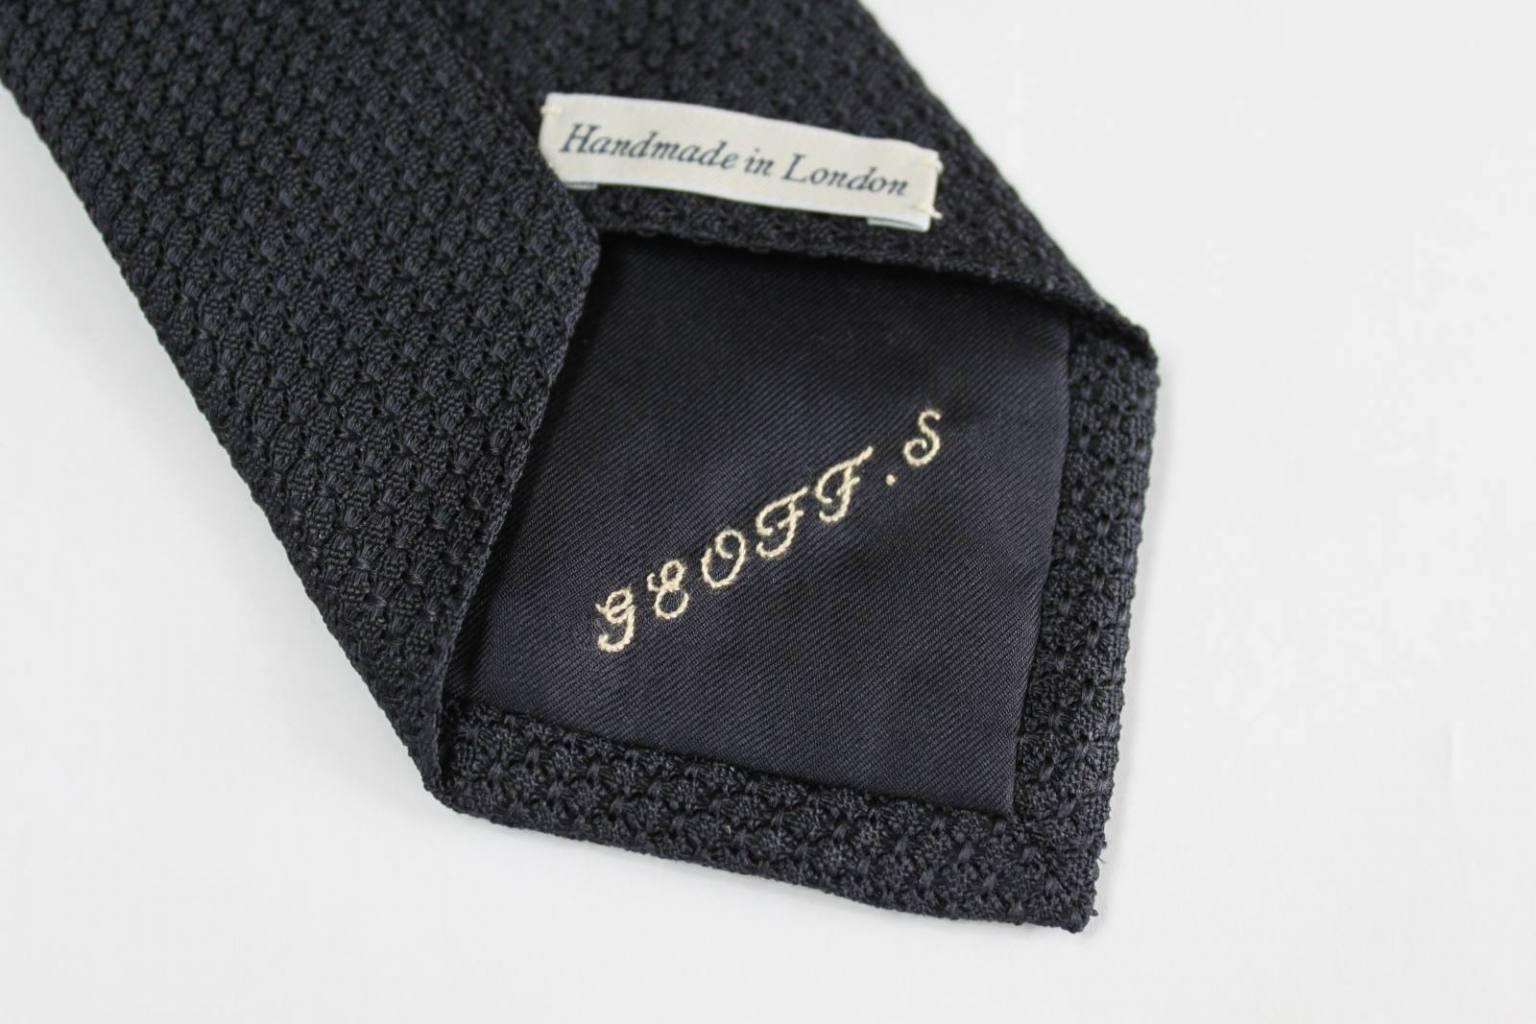 Monogram, monogramming, lettering, stitch, stitching, embroidery, textiles, tie, black tie, accessories